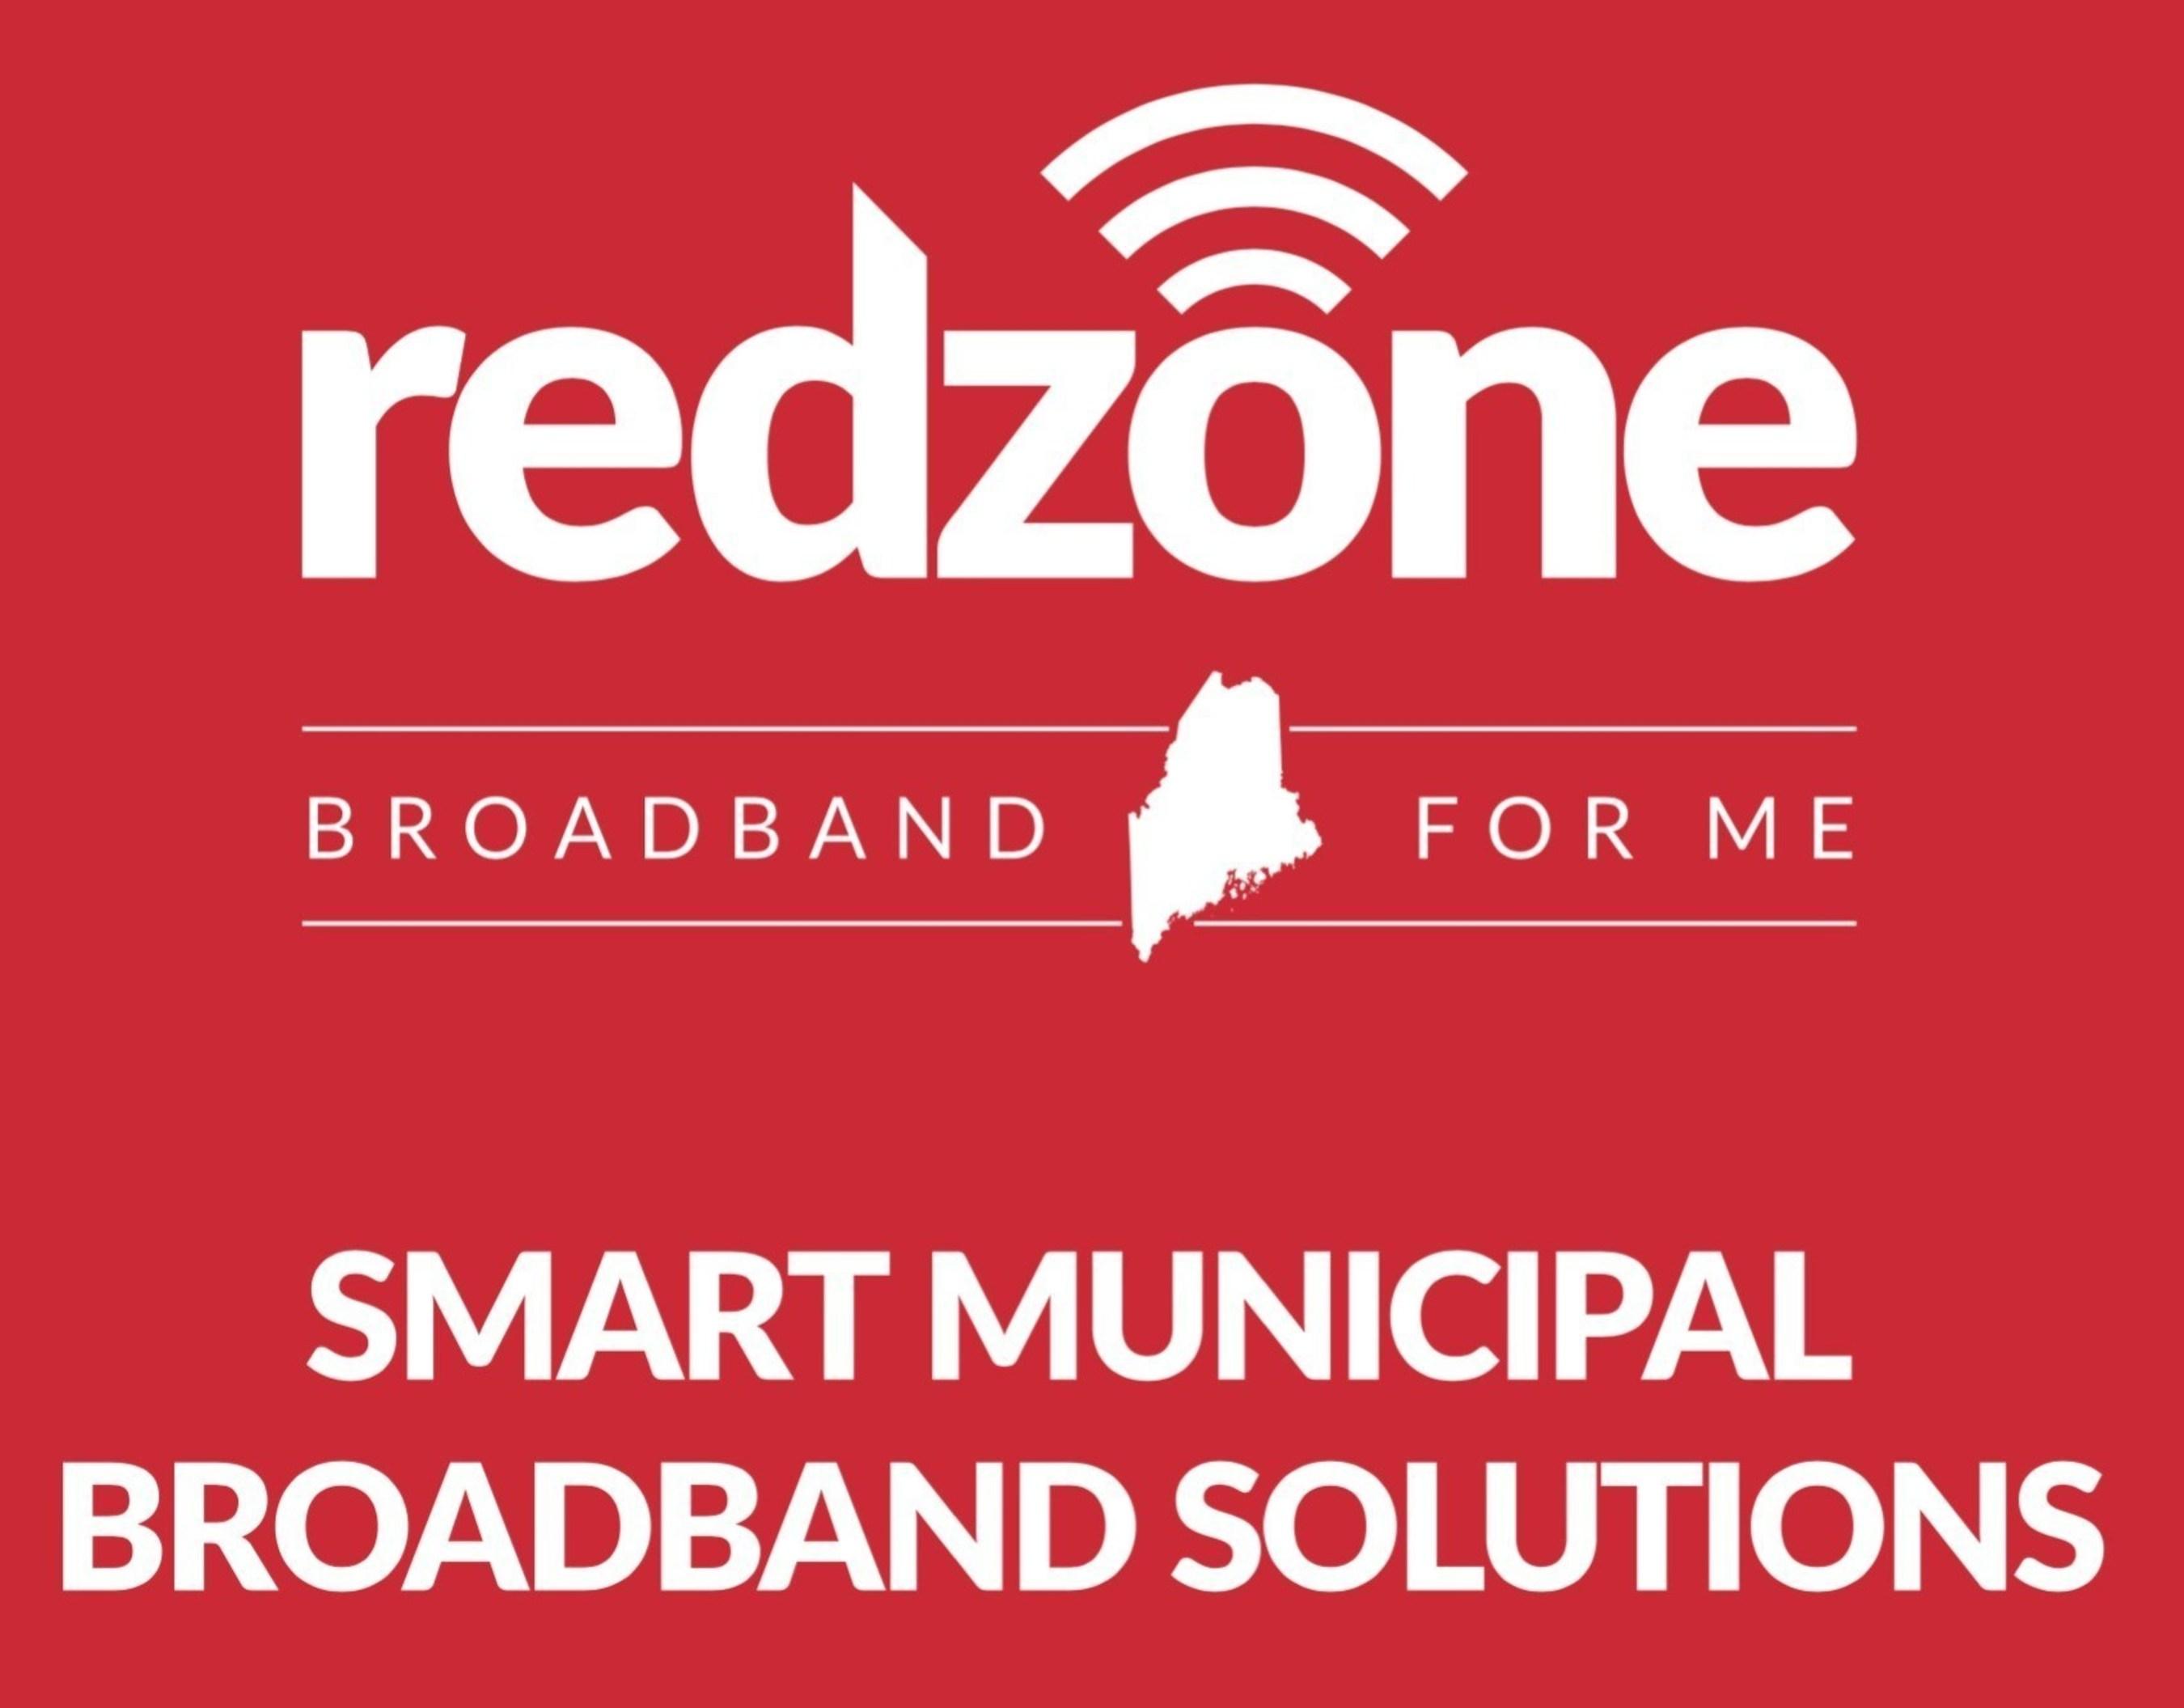 Redzone Wireless, LLC Announces New $1M Municipal Broadband Funding Program to Improve Rural Maine Communities' Internet Development Options